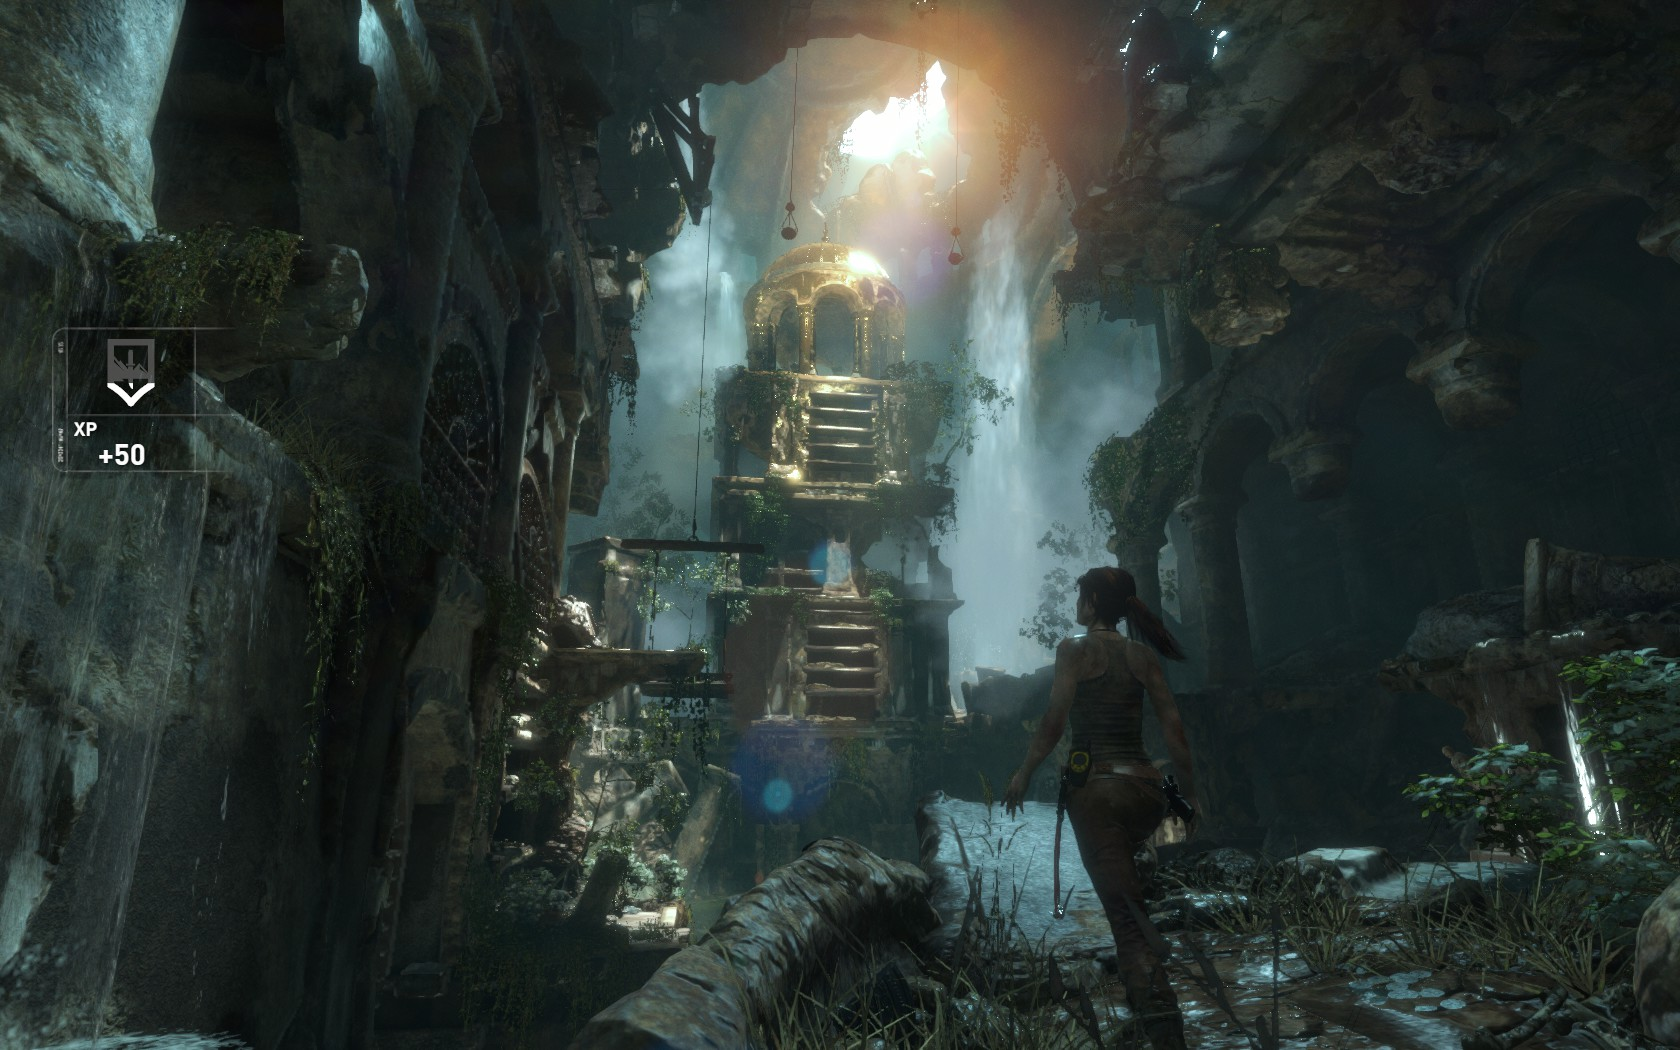 Rise of the Tomb Raider - PC verze pod drobnohledem 118485